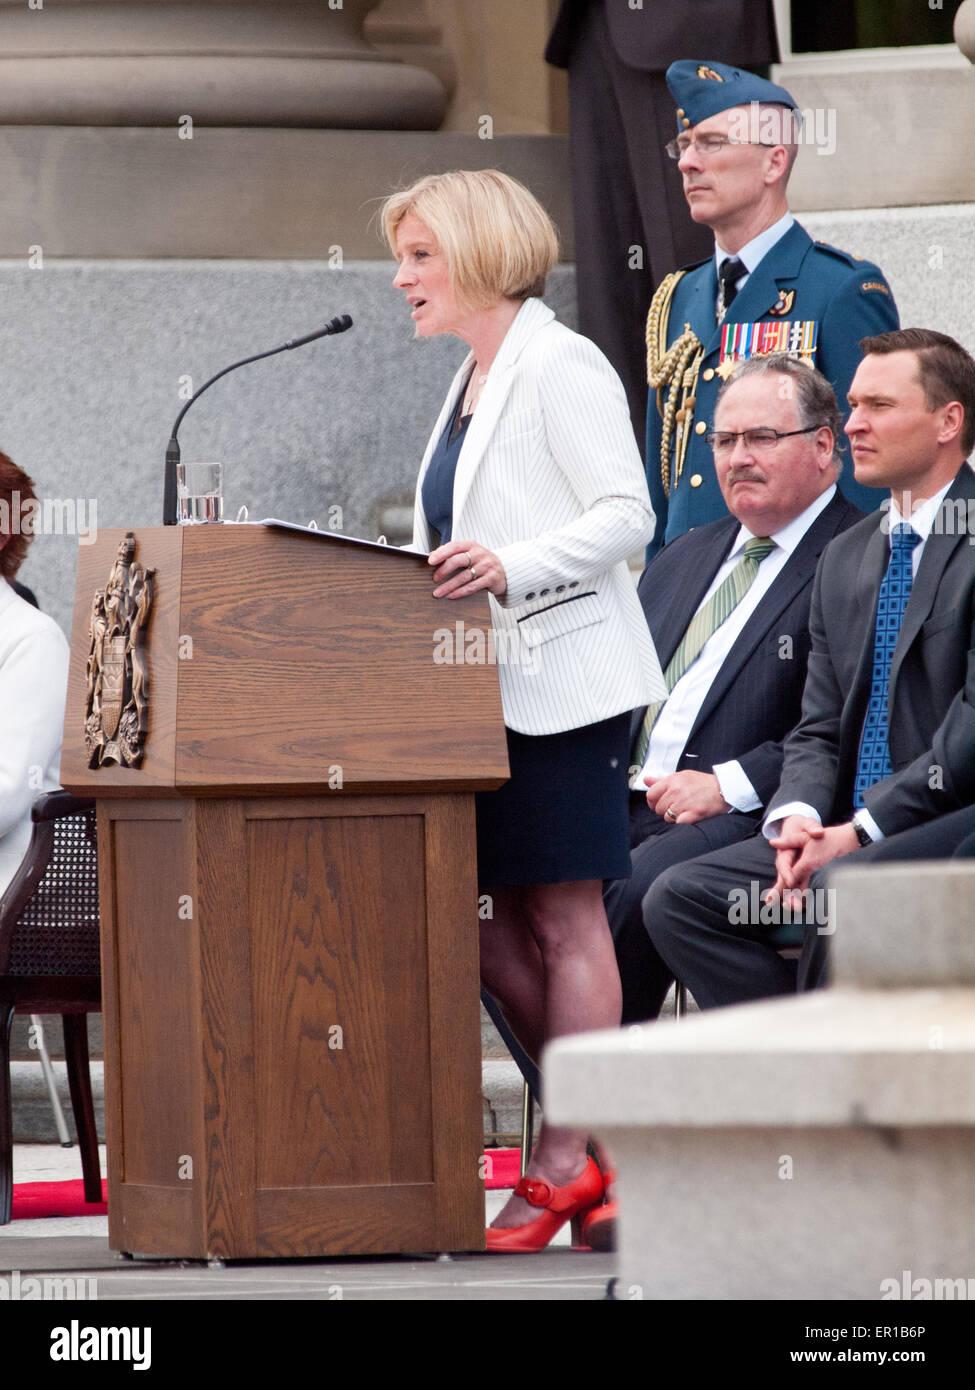 Edmonton, Alberta, Canada. 24th May, 2015. Alberta New Democratic Party (NDP) Premier Rachel Notley and Cabinet - Stock Image